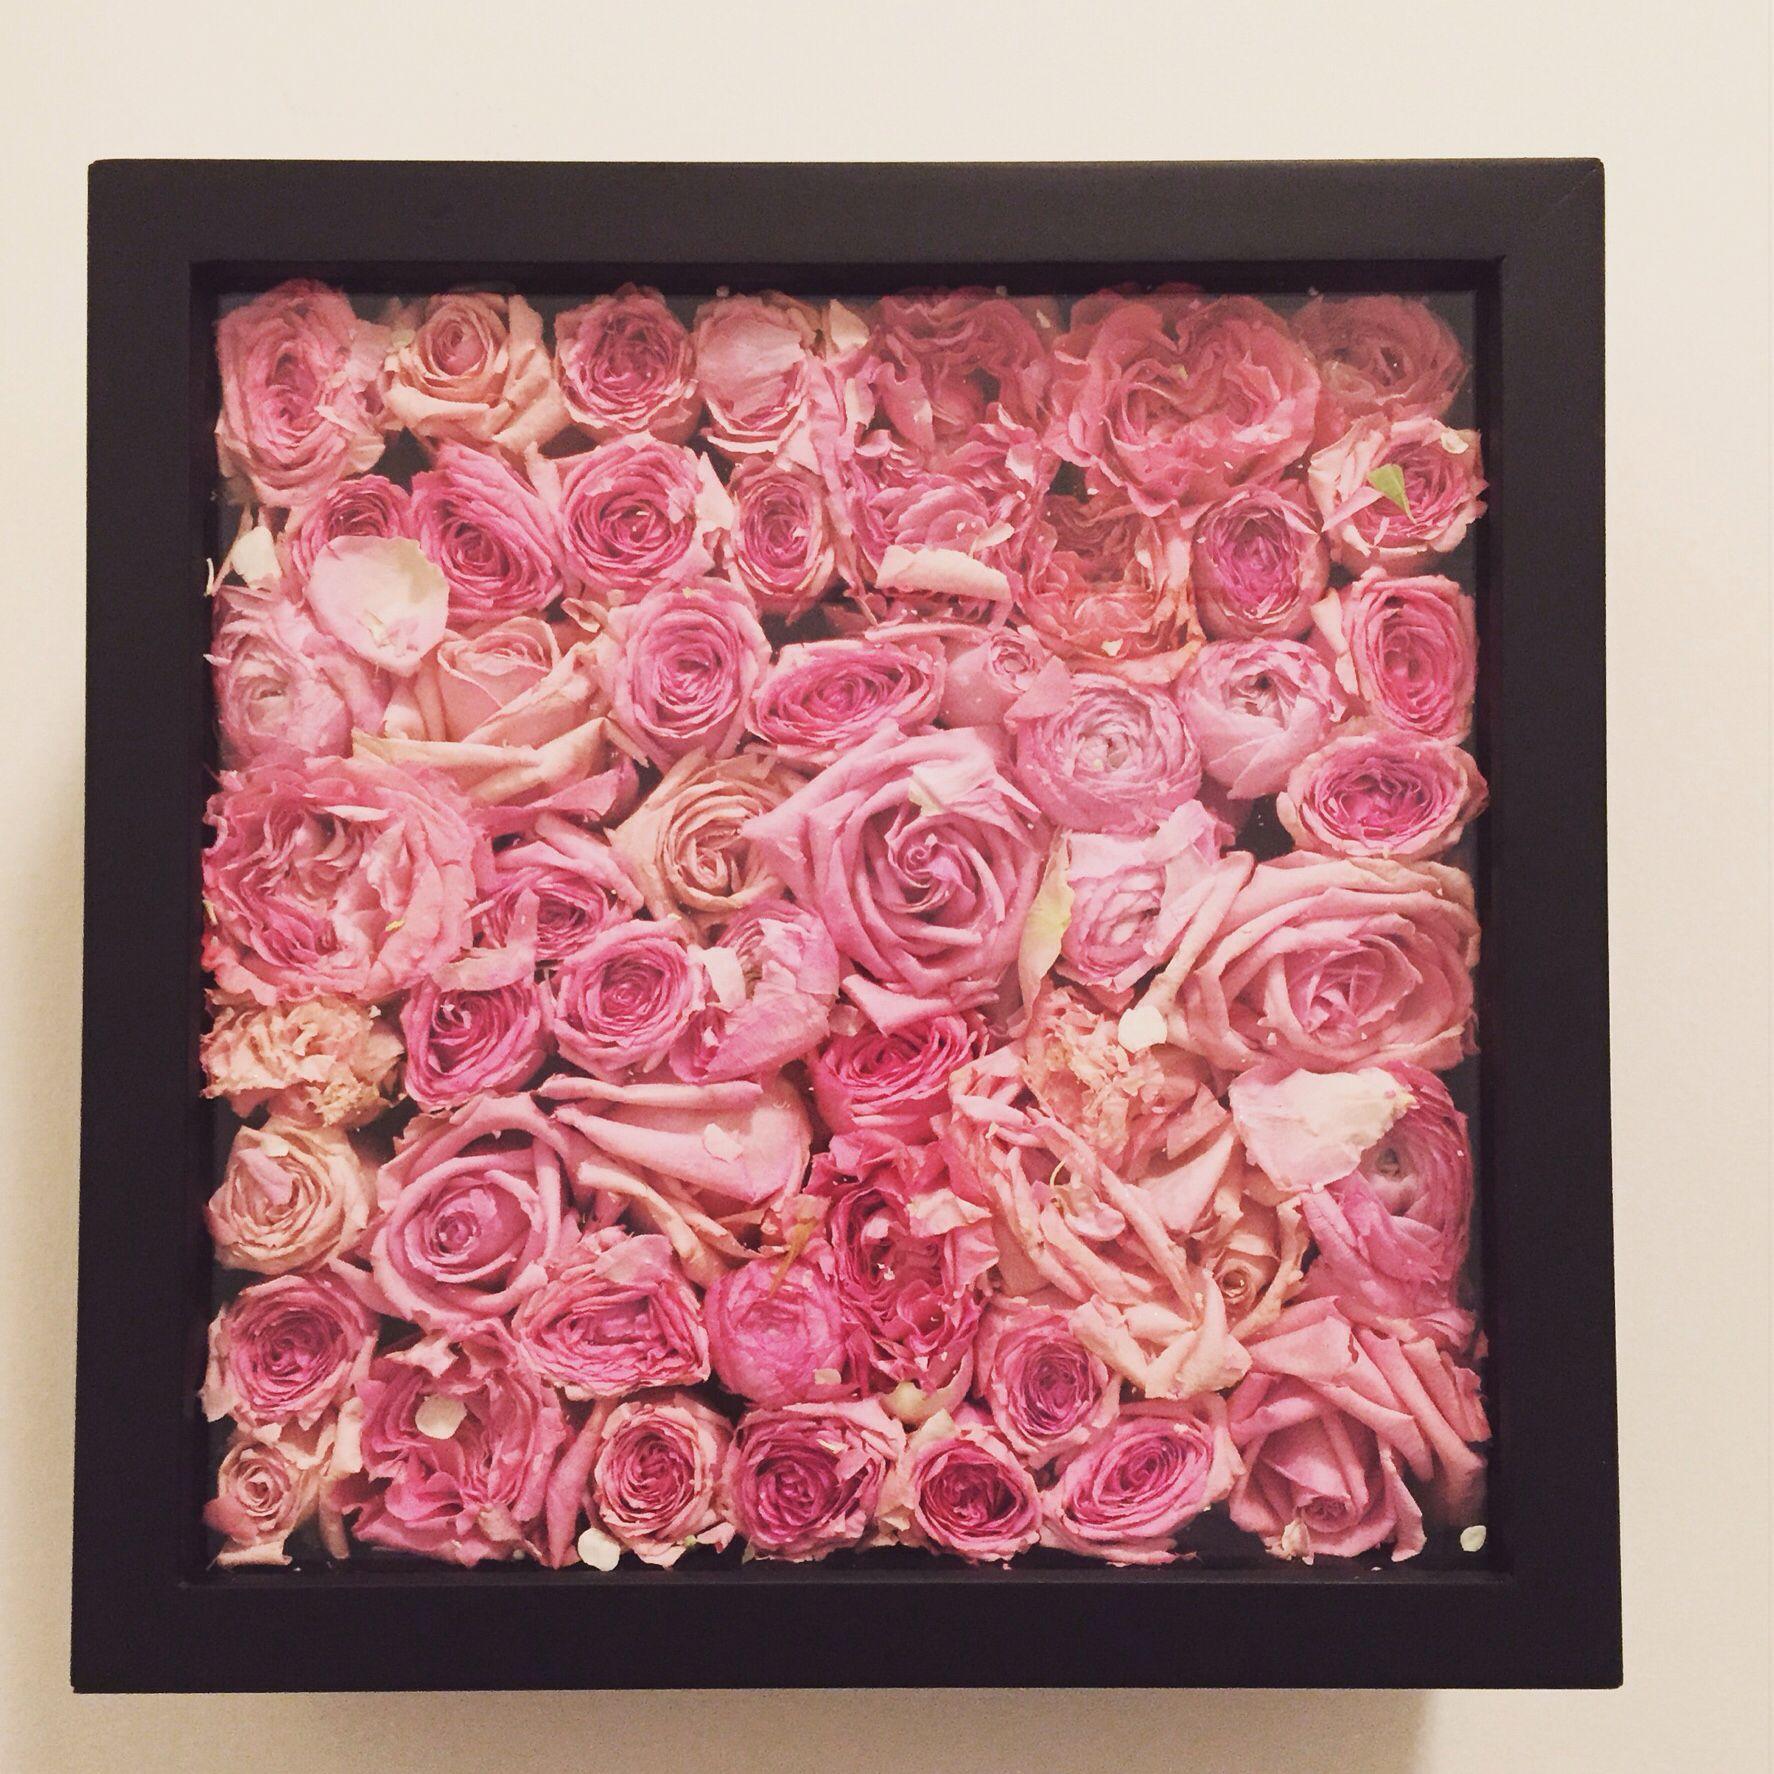 Shadow Box Diy With My Wedding Flowers Freeze Dried By Pink